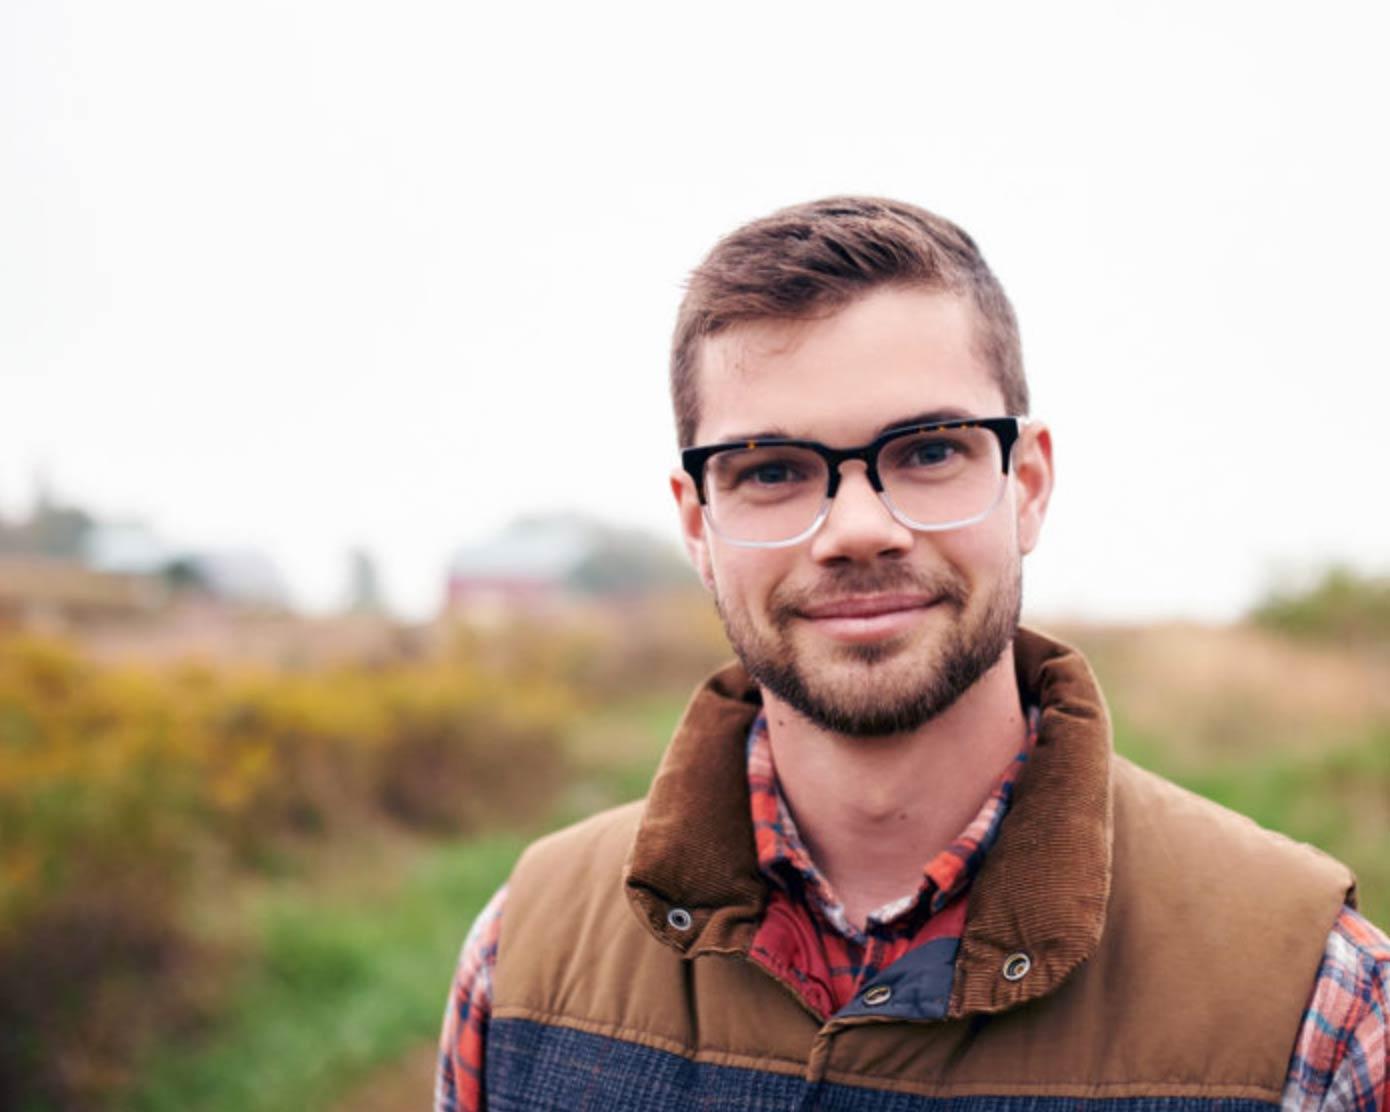 jeune-agriculteur-homme-ja-agriculture-adherent